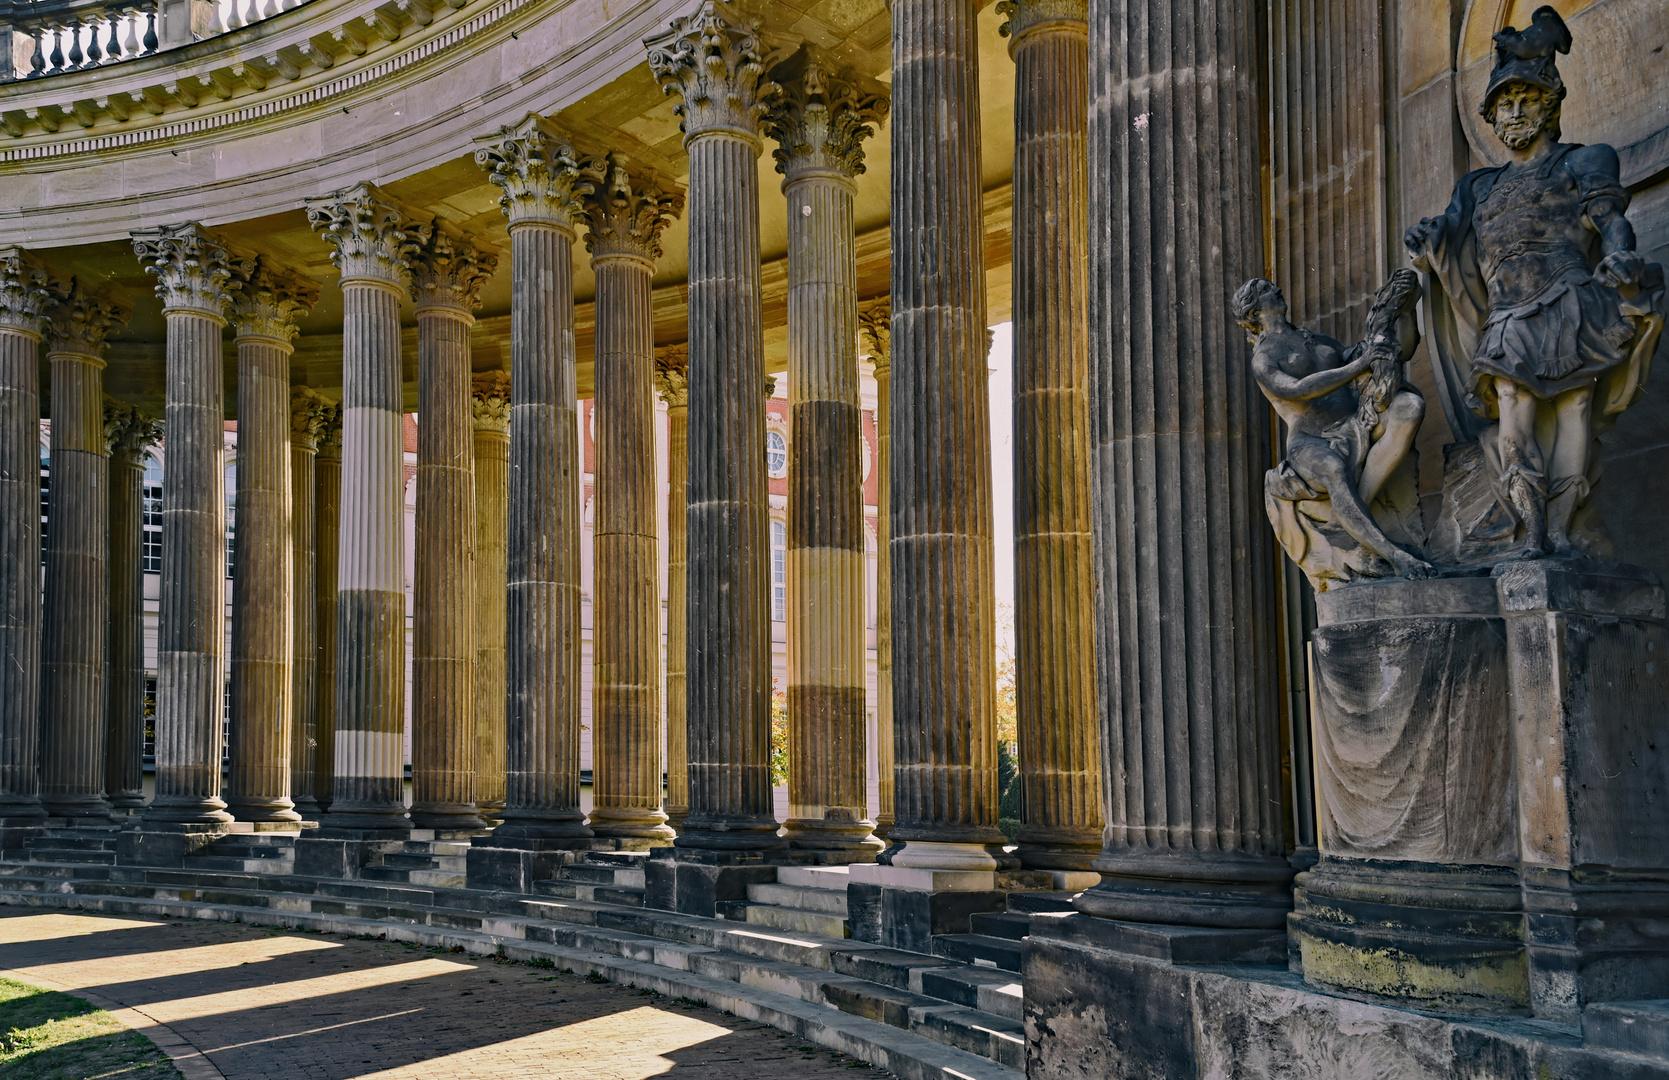 Neues Palaise Potsdam